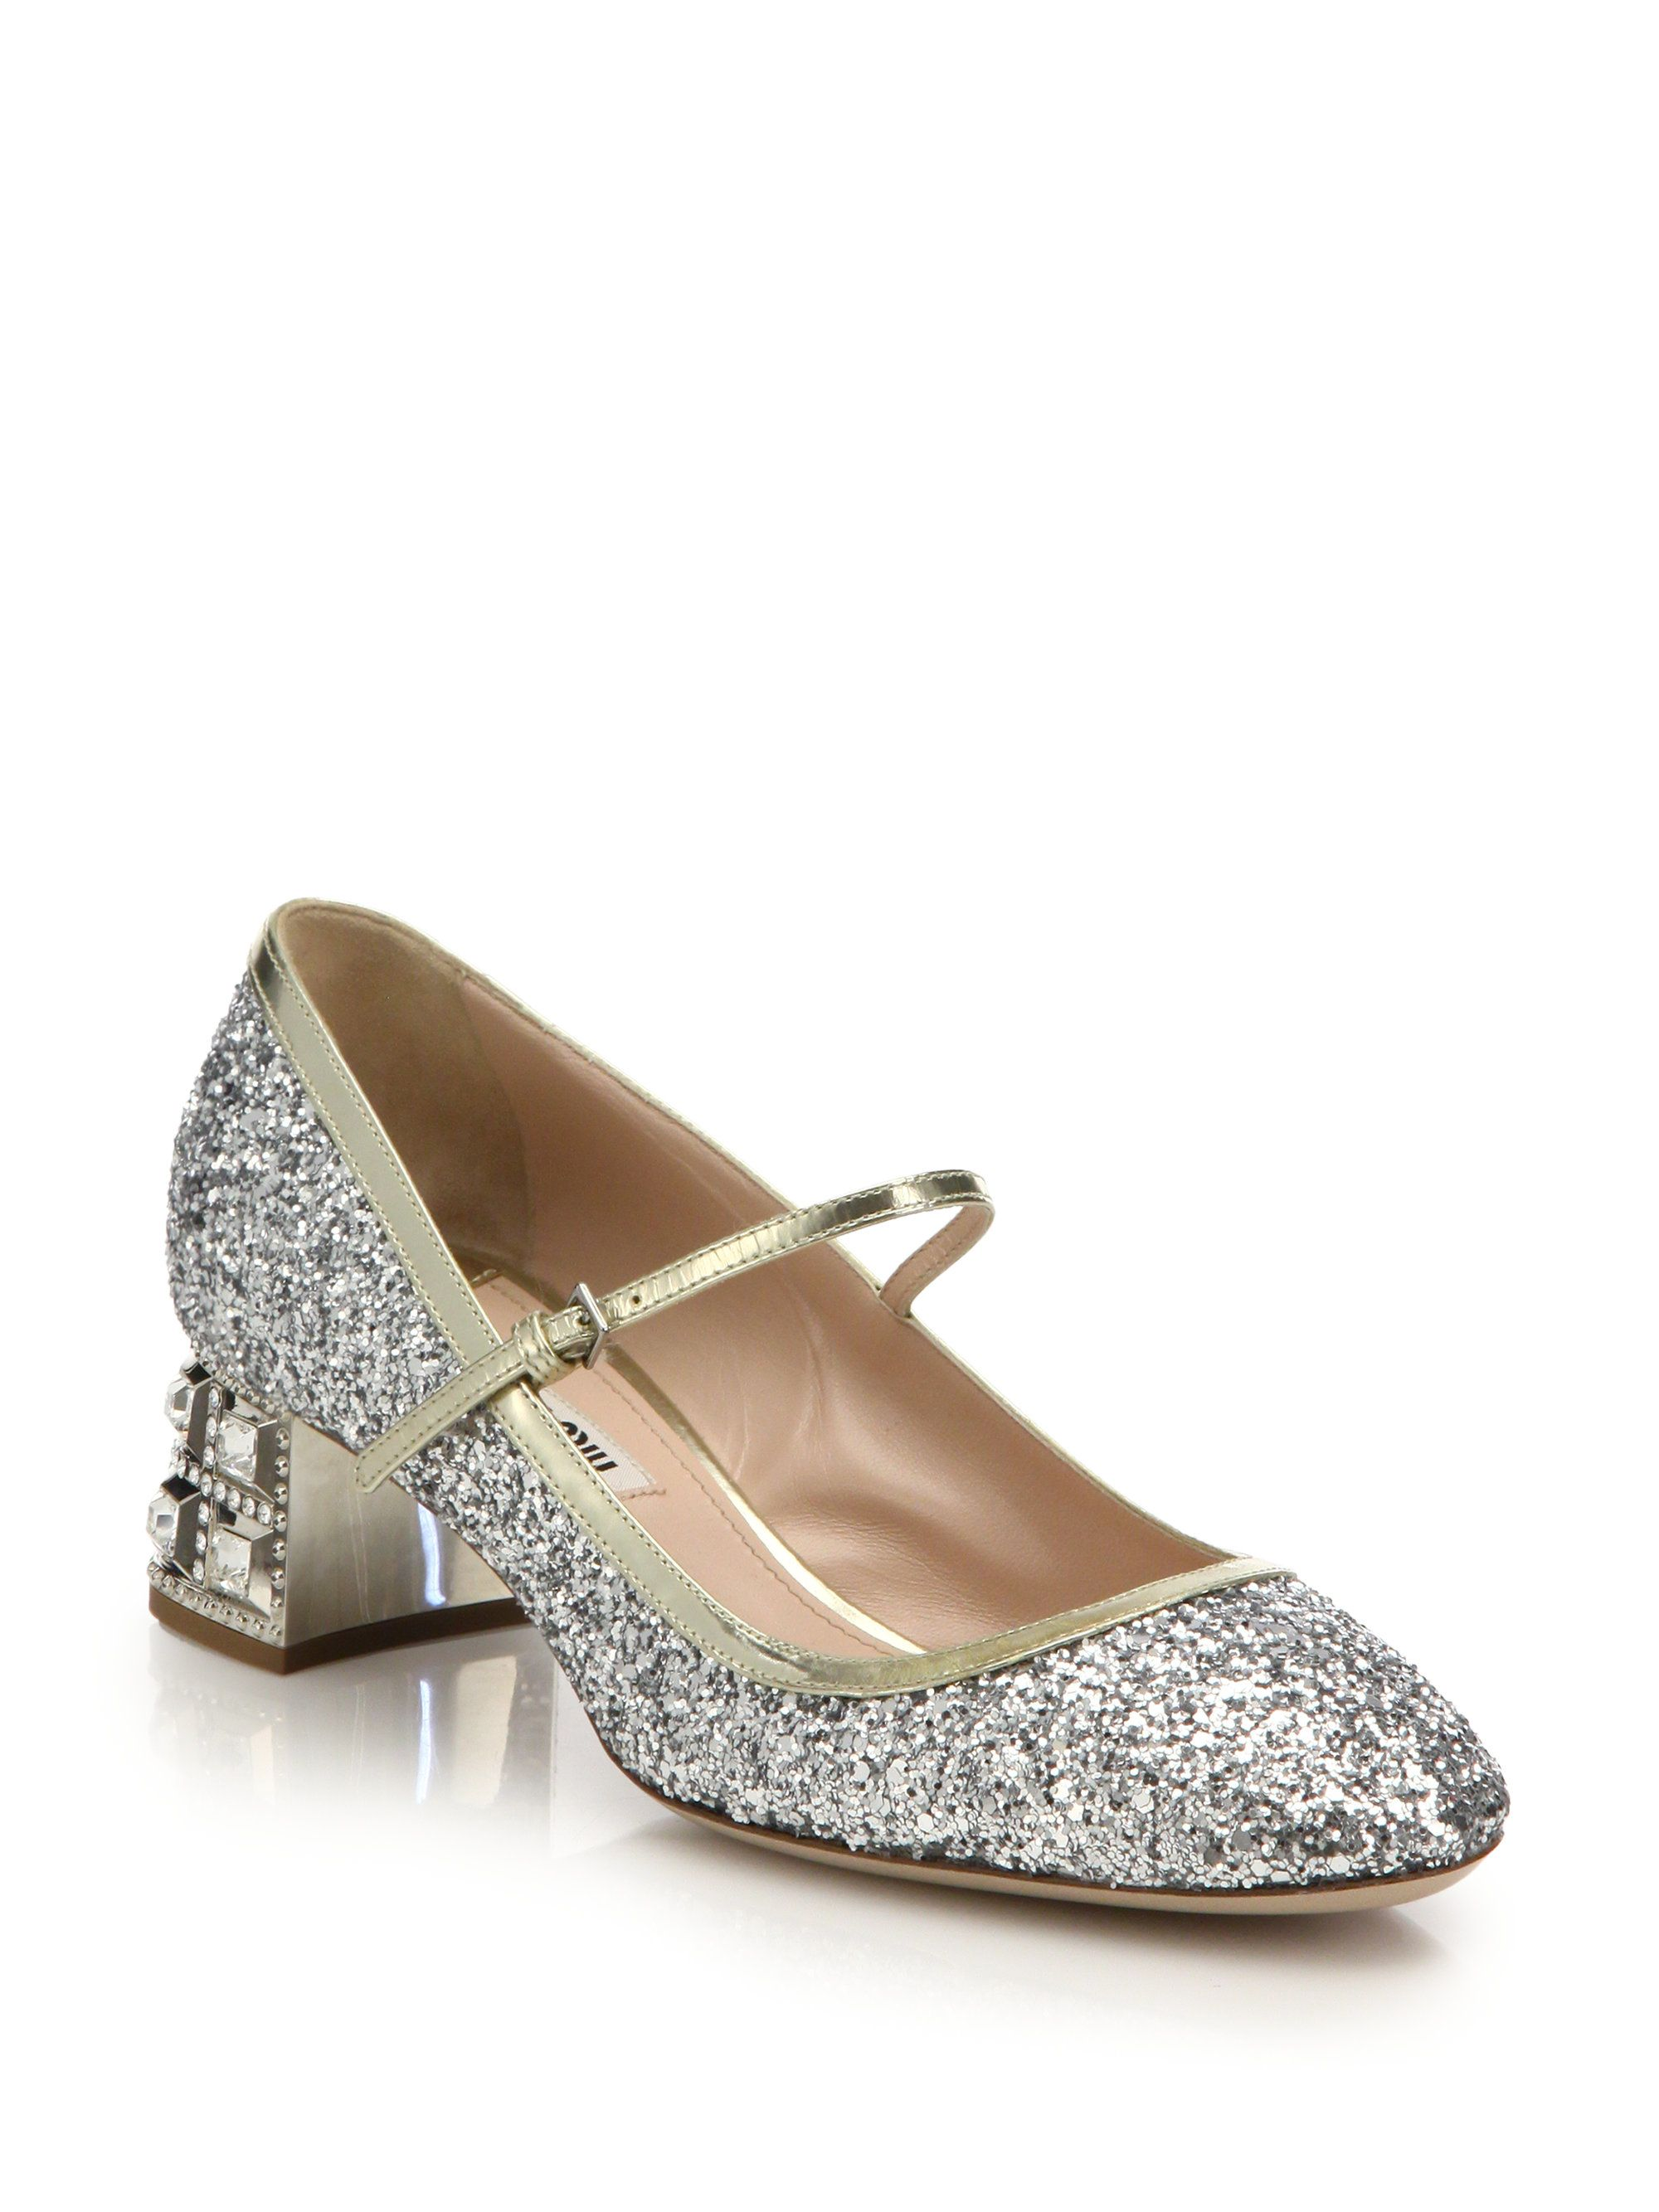 29872918e9bf4 Miu Miu | Multicolor Glitter Mary Jane Pumps | Lyst | Gifts: The ...